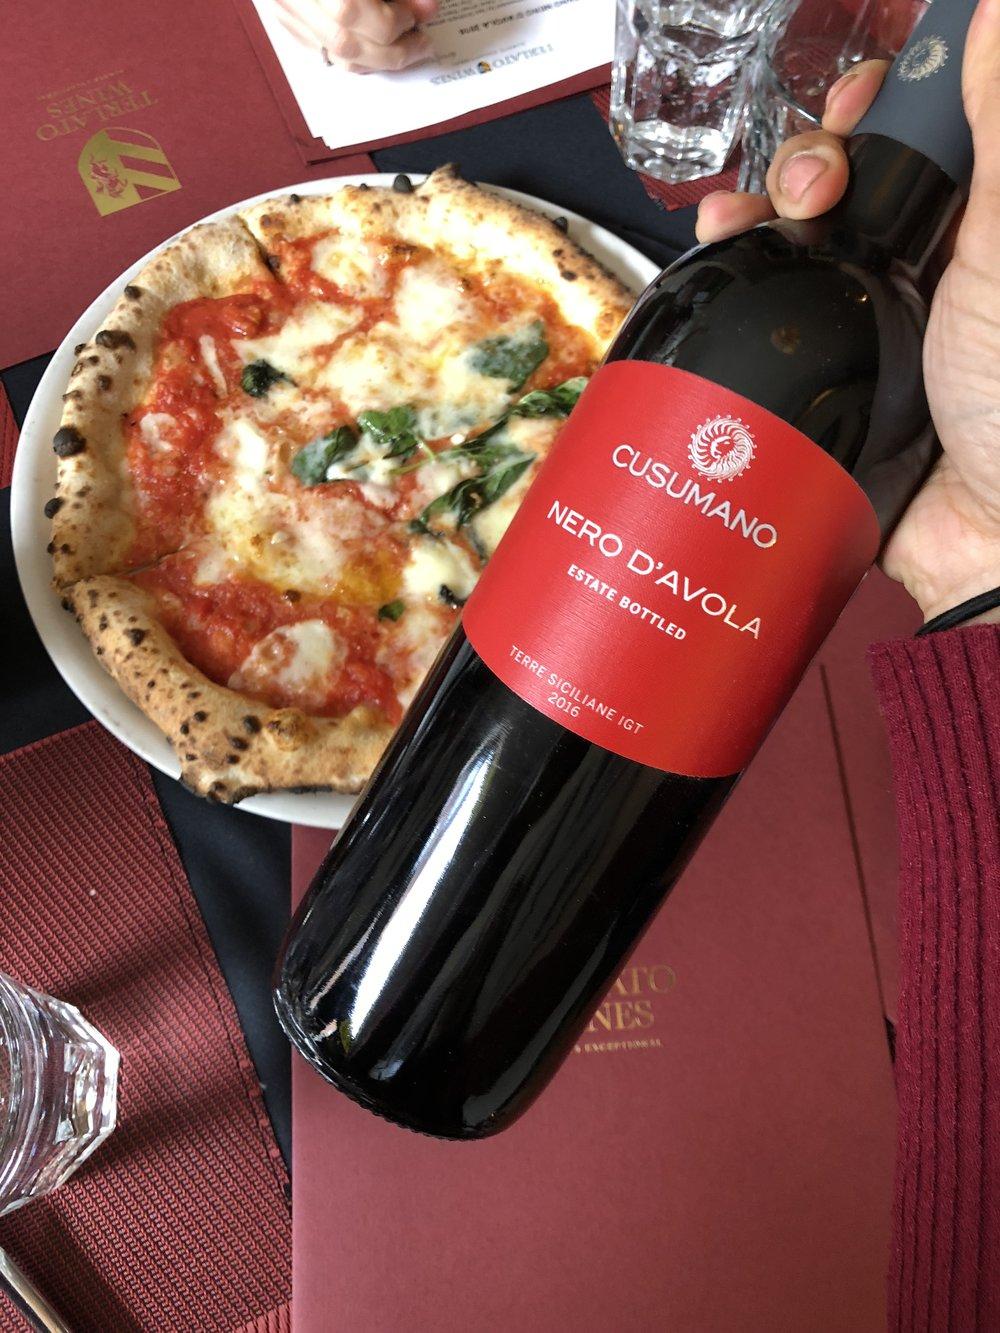 Margherita + Cusumano's Nero D'Avola